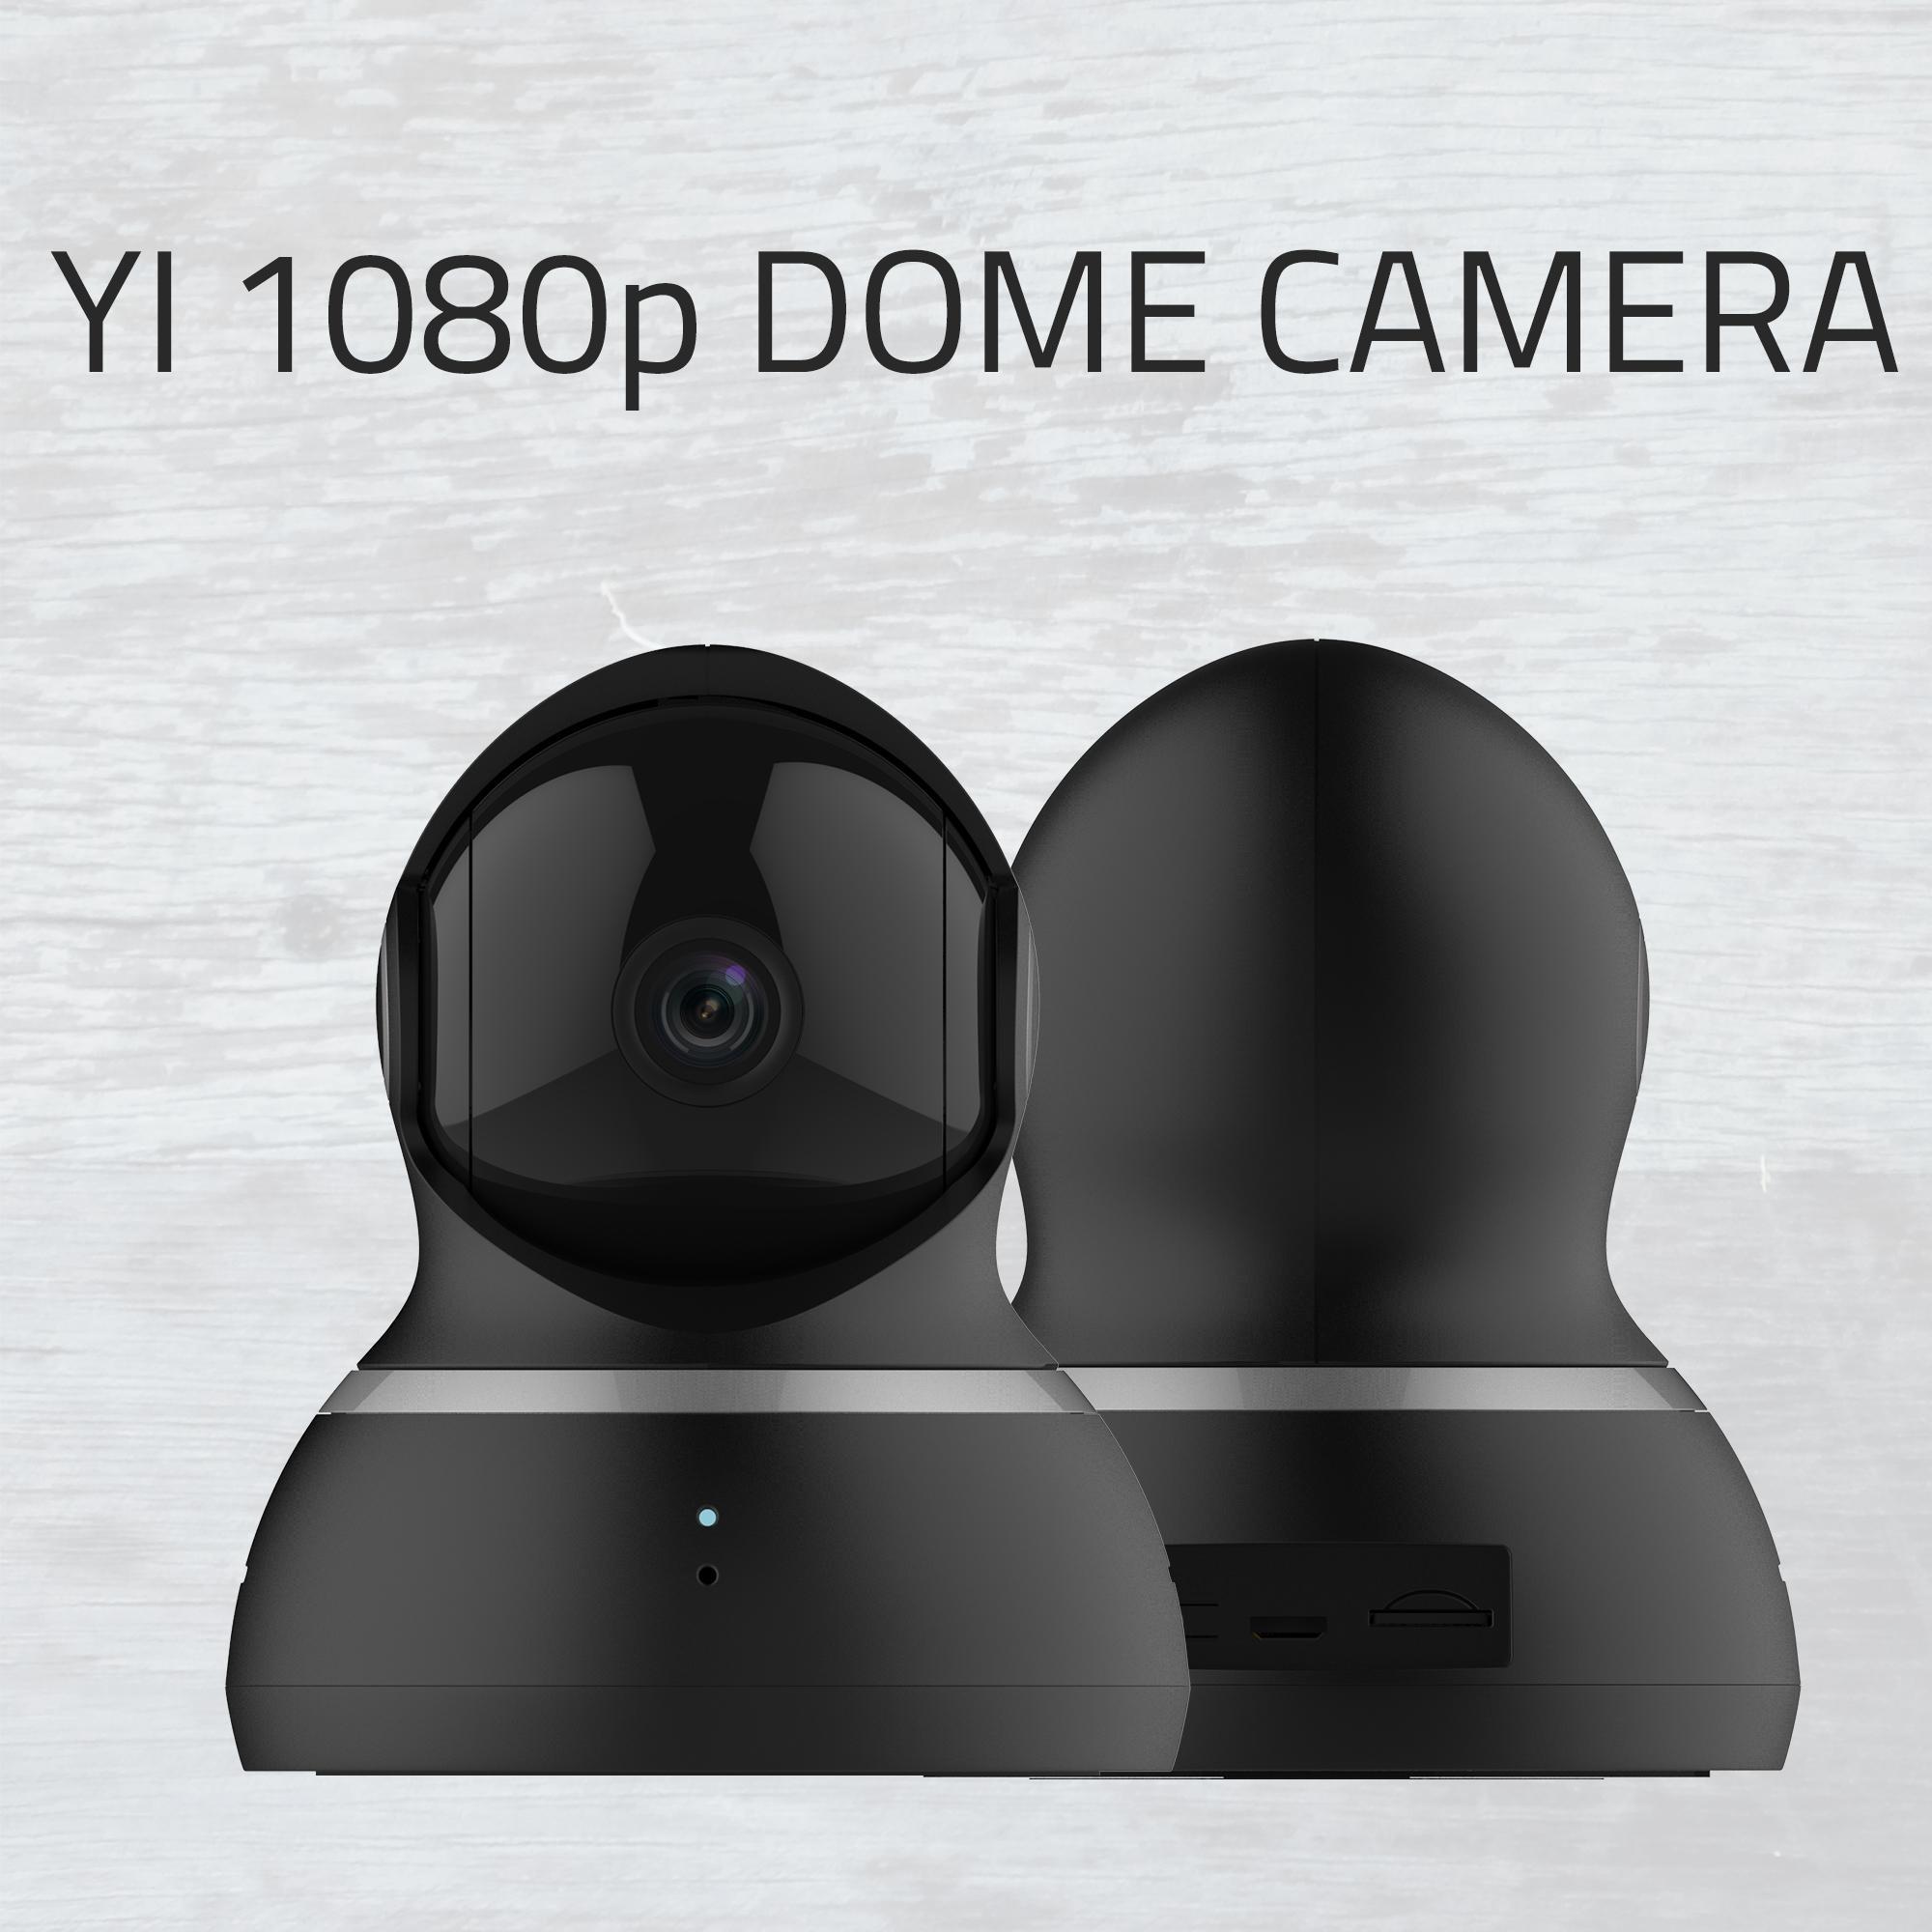 Yi Dome